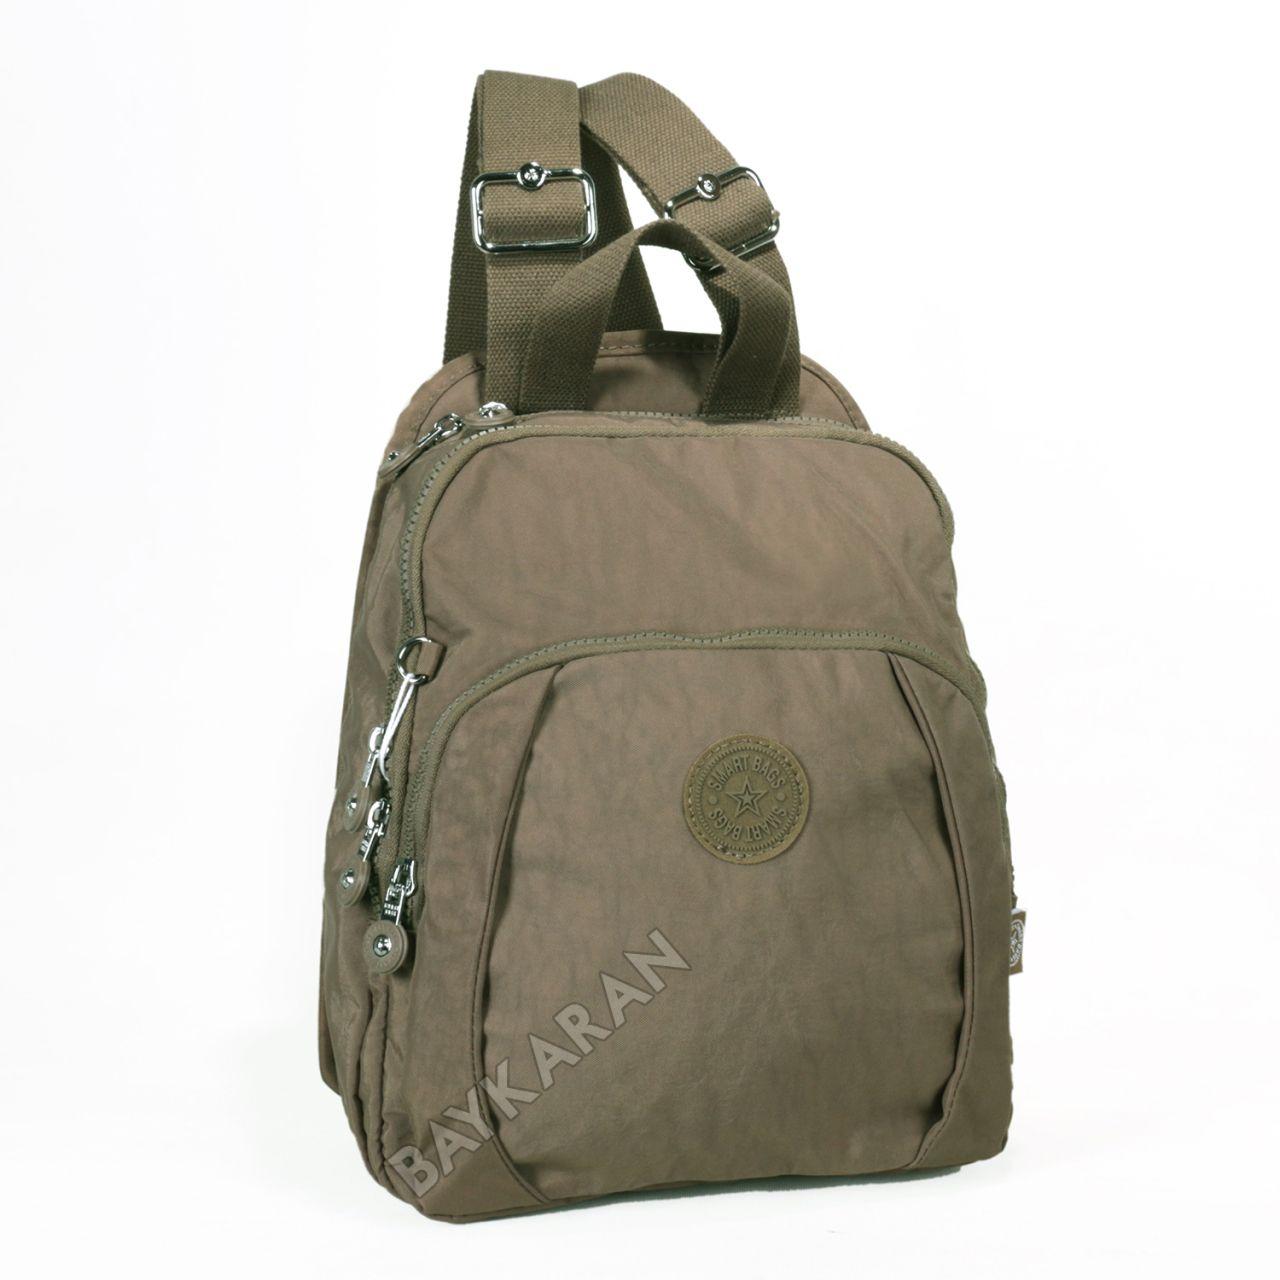 42857e8e0933b KÜÇÜK BOY 1167-07 Açık Kahve Krinkıl Kumaş Bayan Sırt Çantası Smart Bags